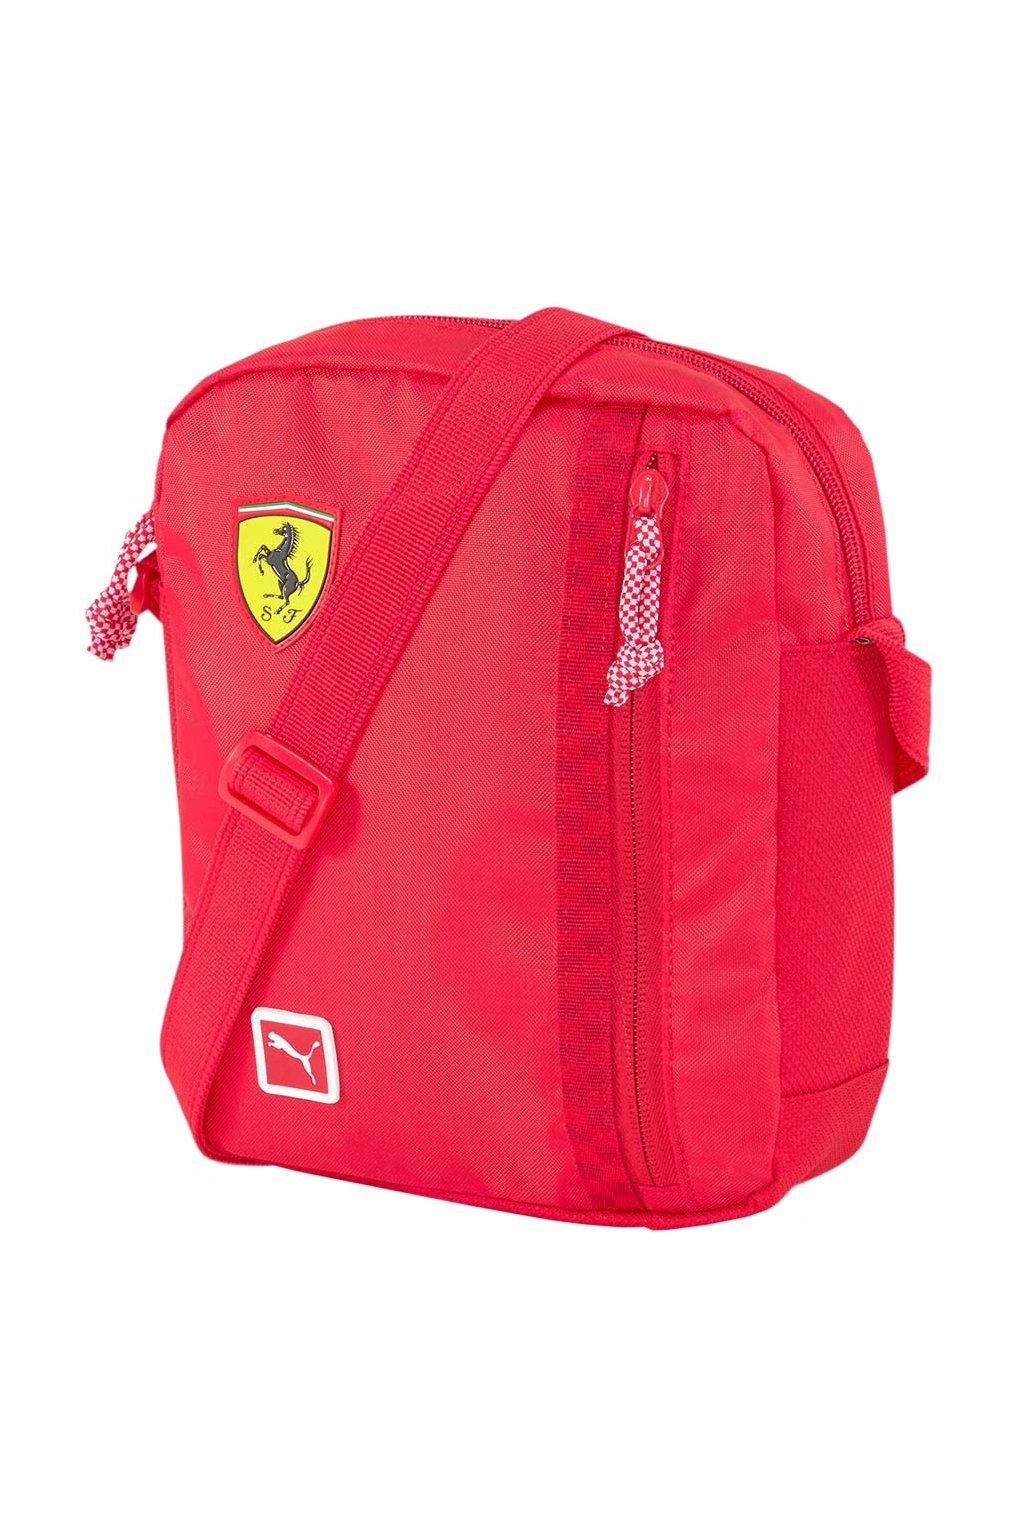 Taška Puma Ferrari Fanwear Portable červená 076884 01